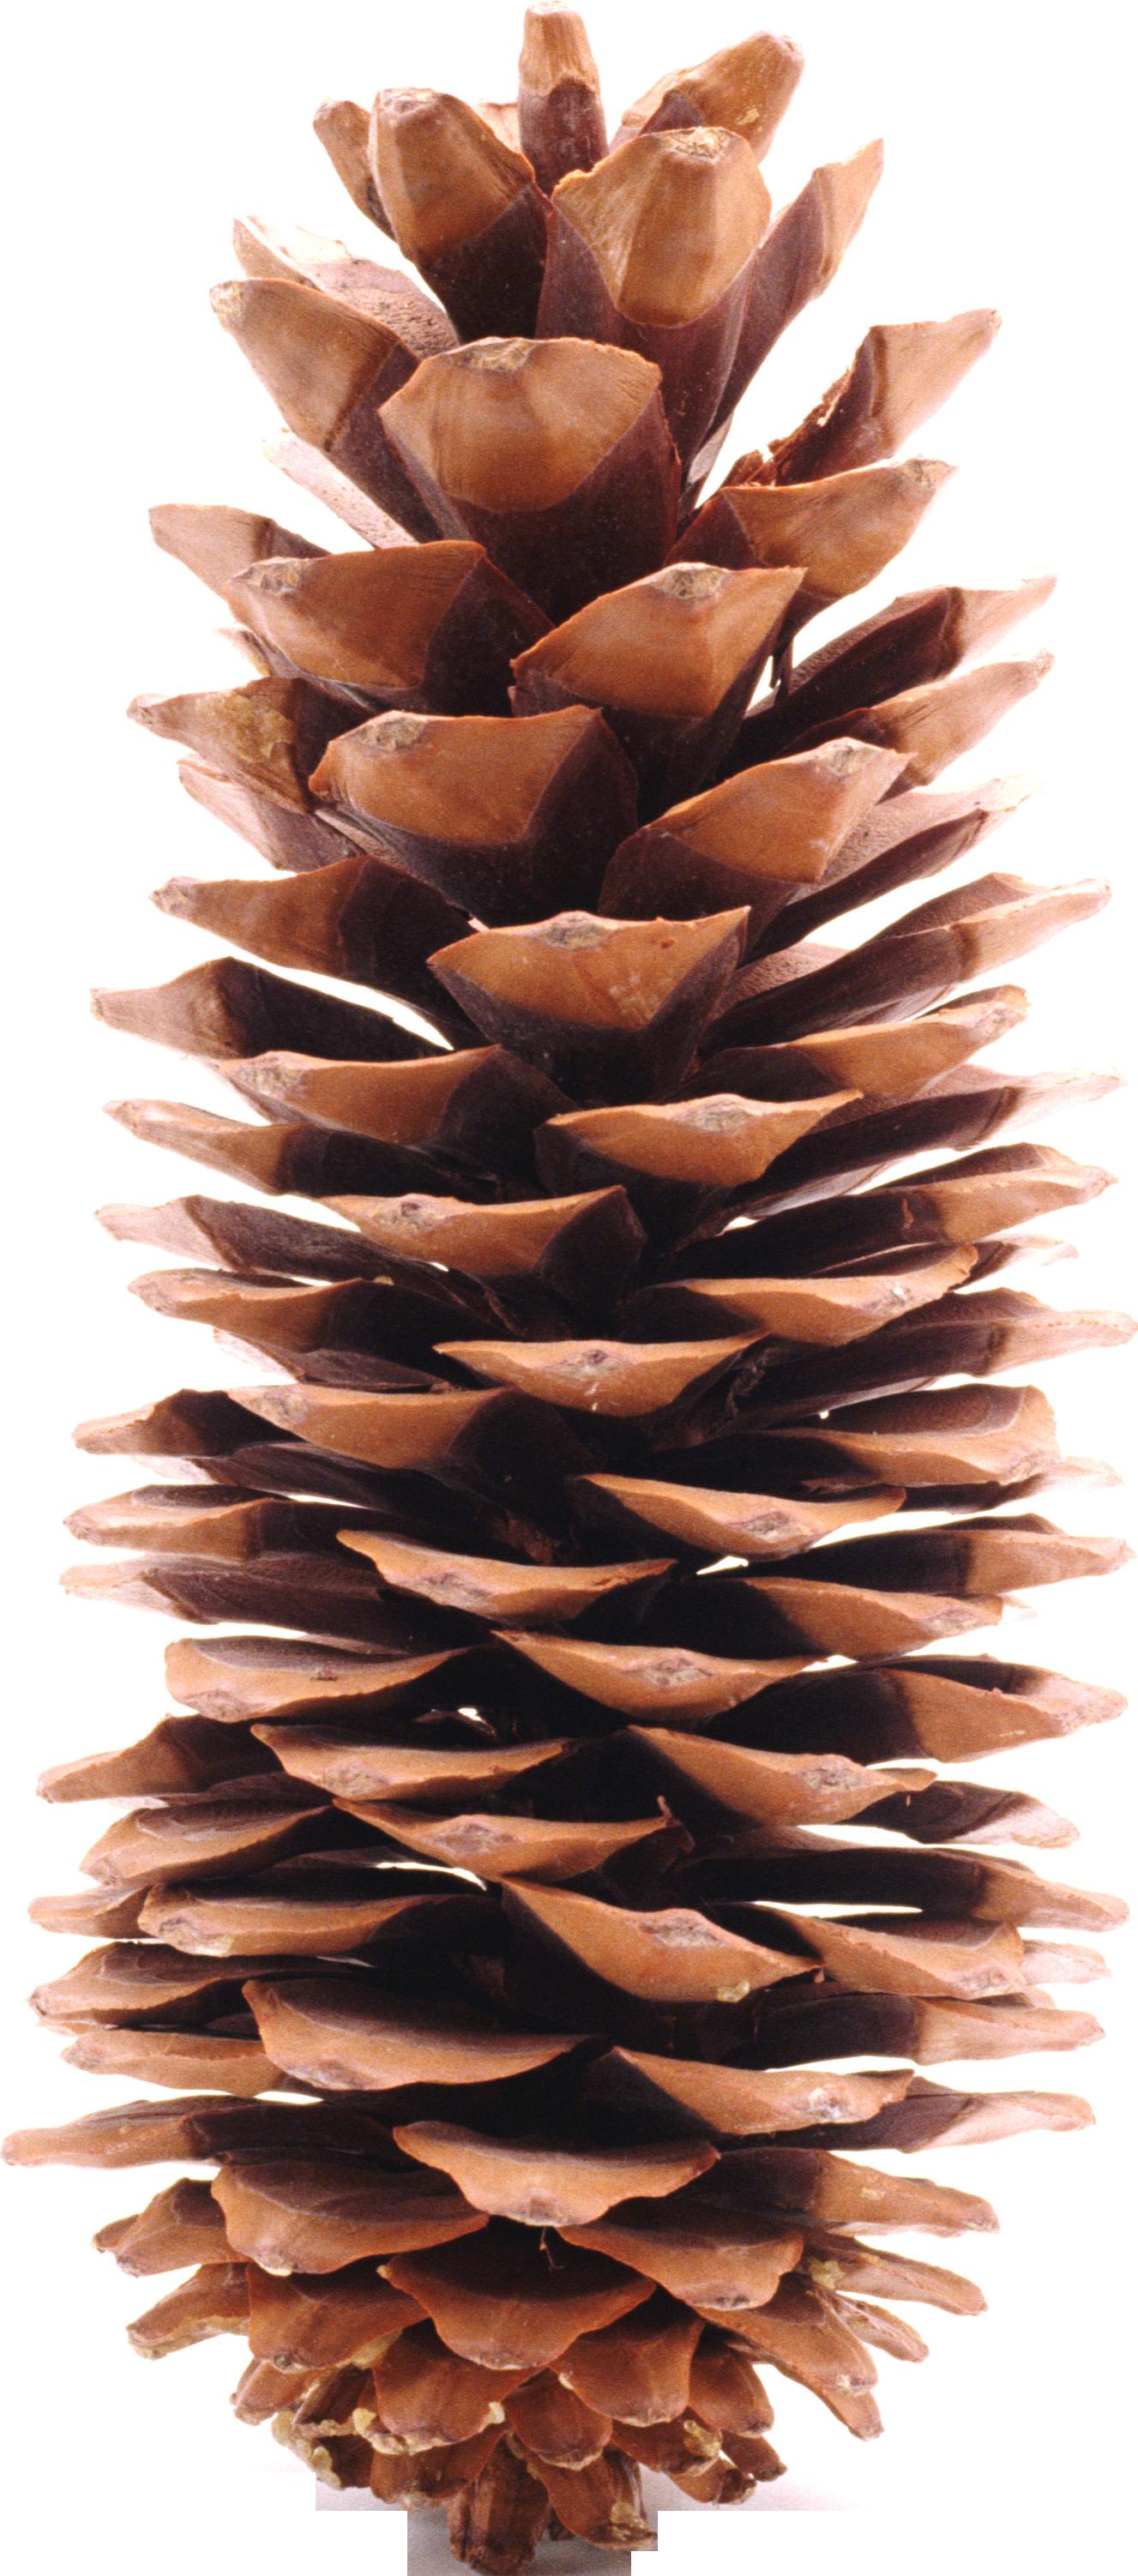 Pine Cone Png Image Pine Cones Cone Conifers